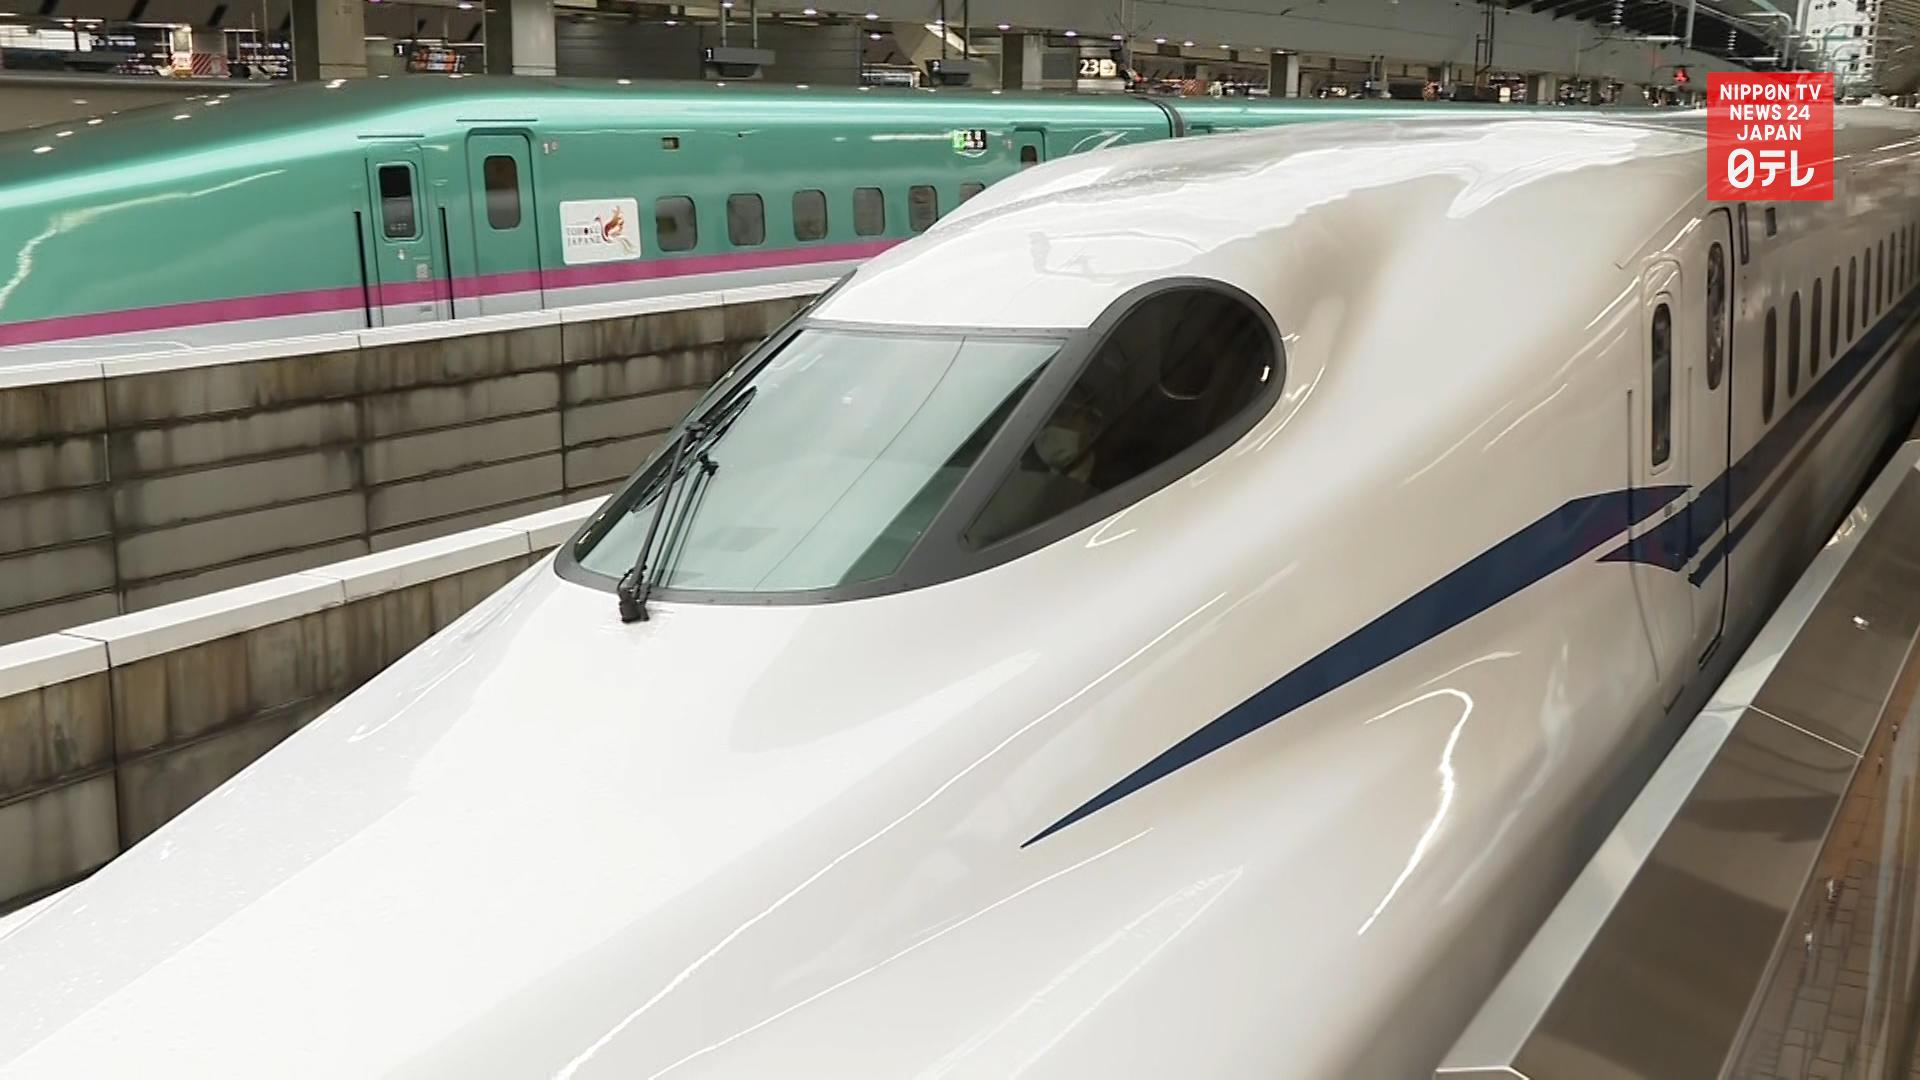 New Shinkansen bullet train model debuts